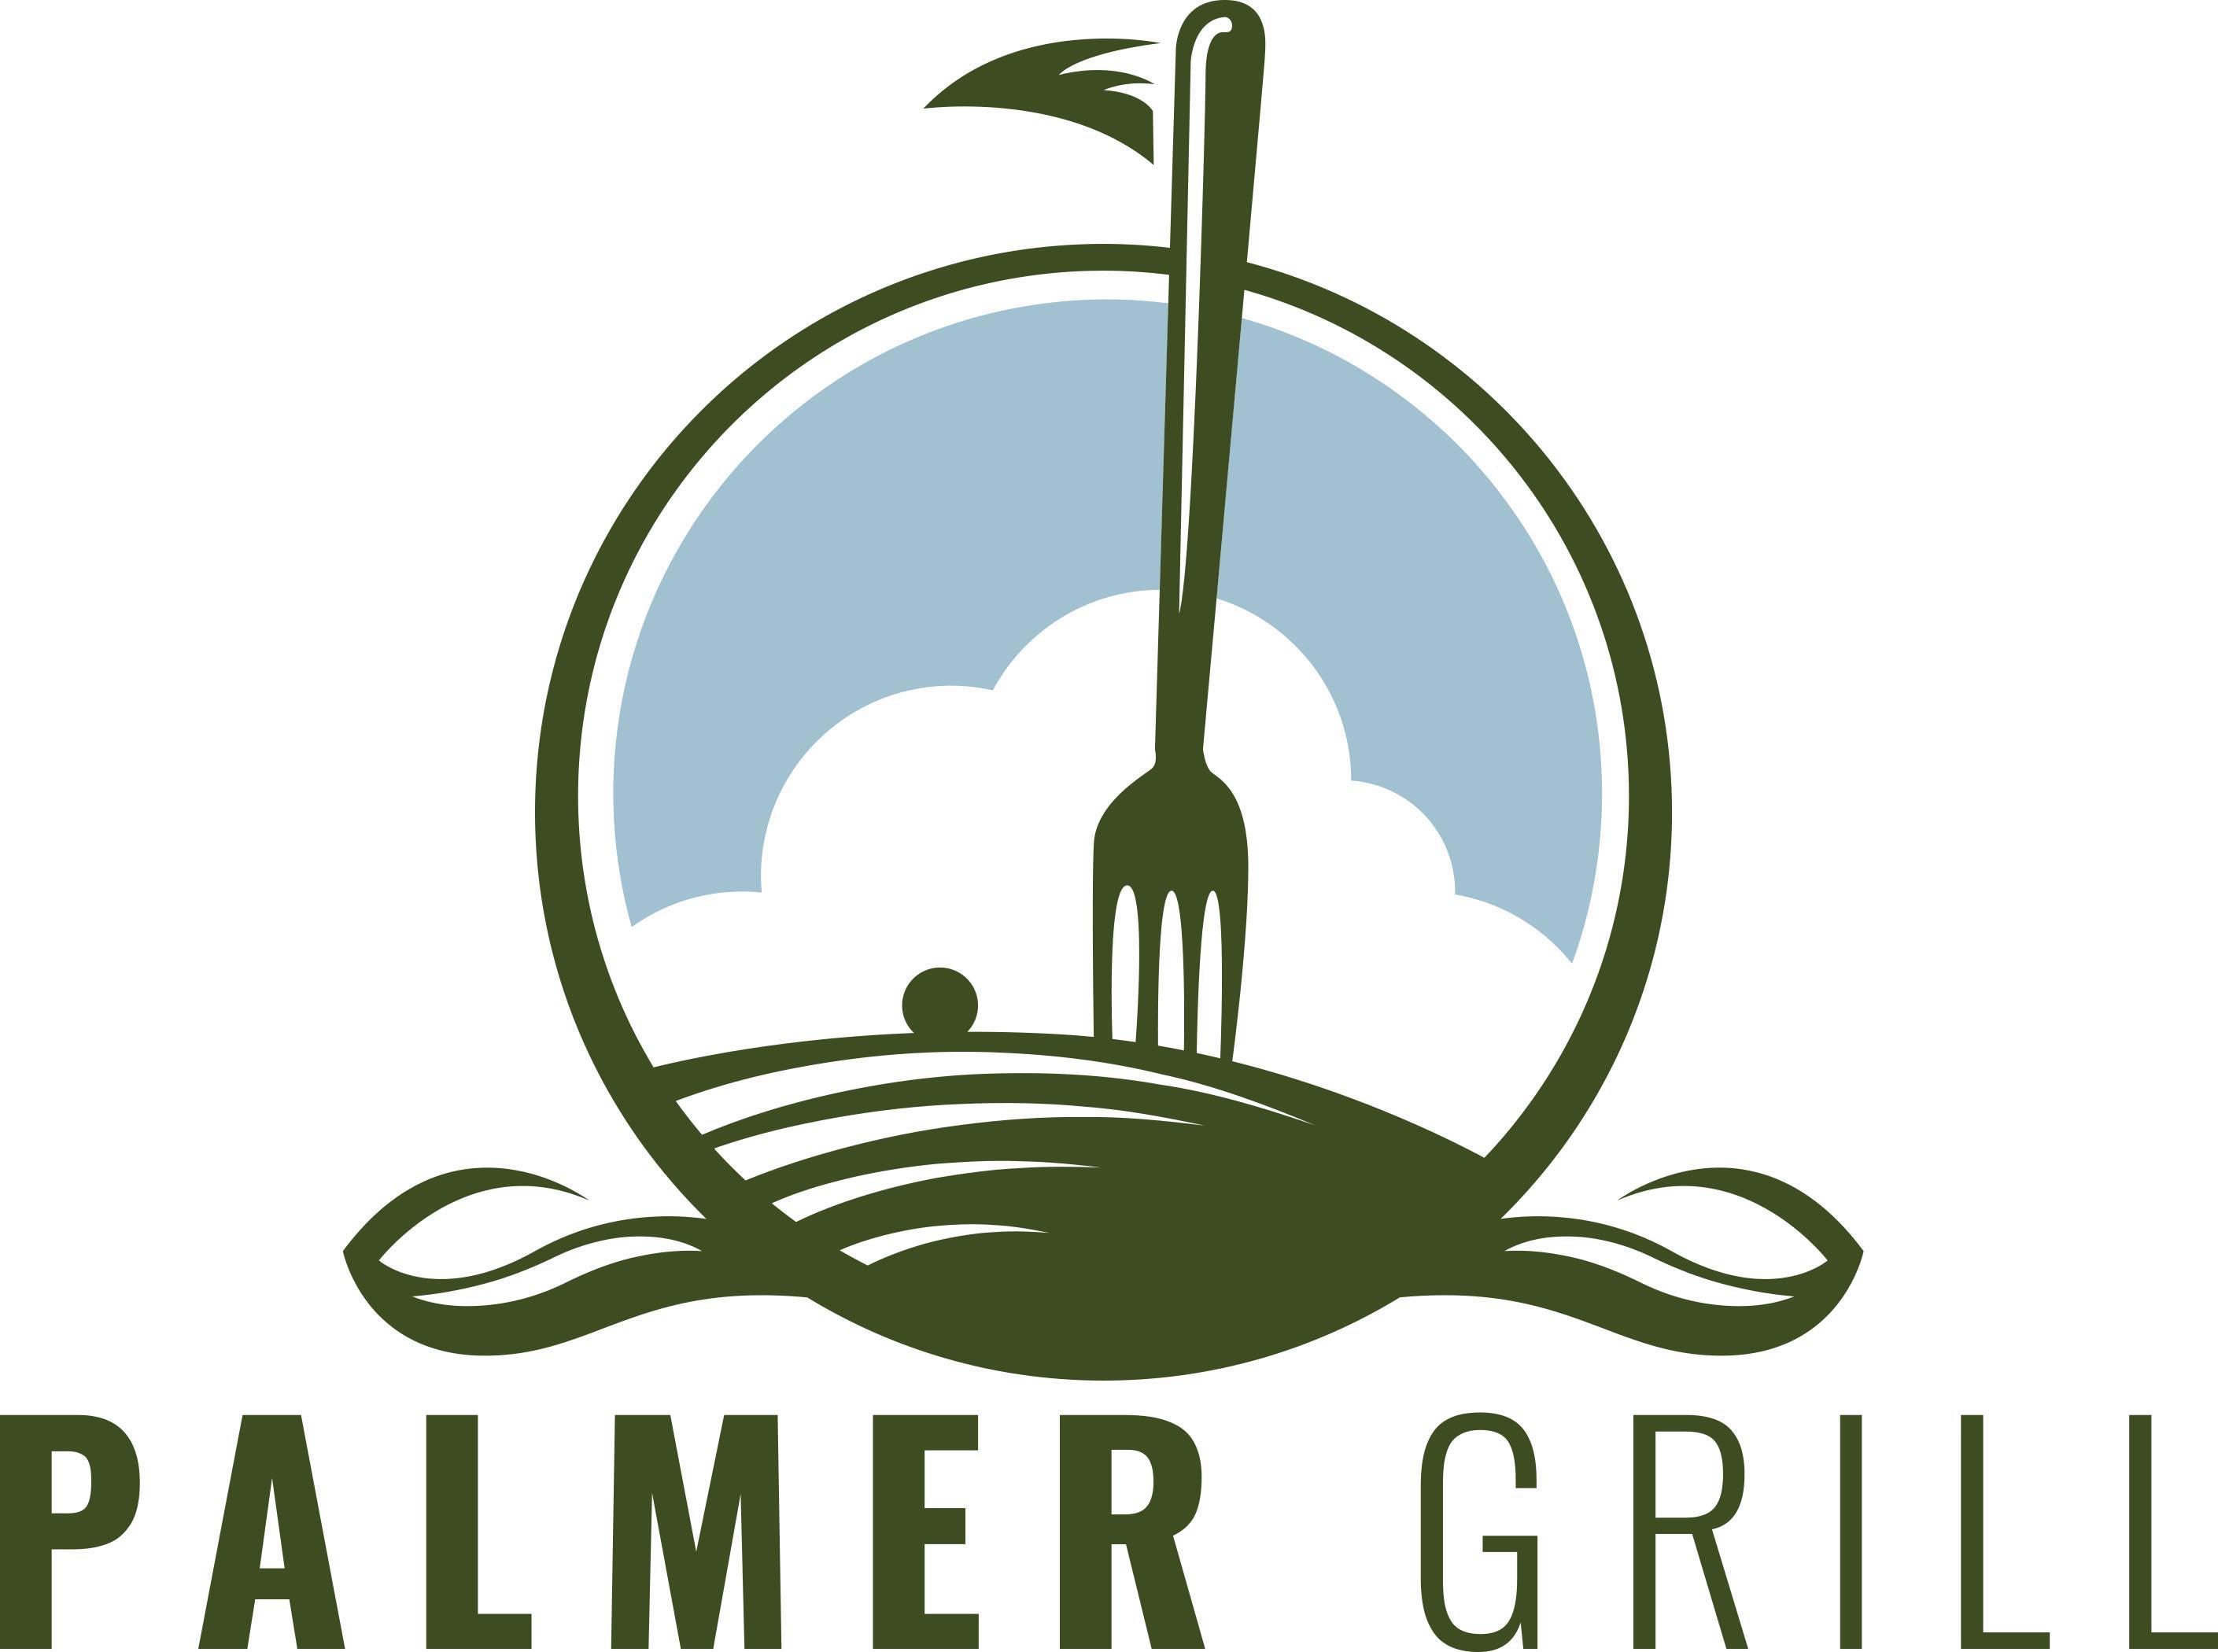 Palmer Grill